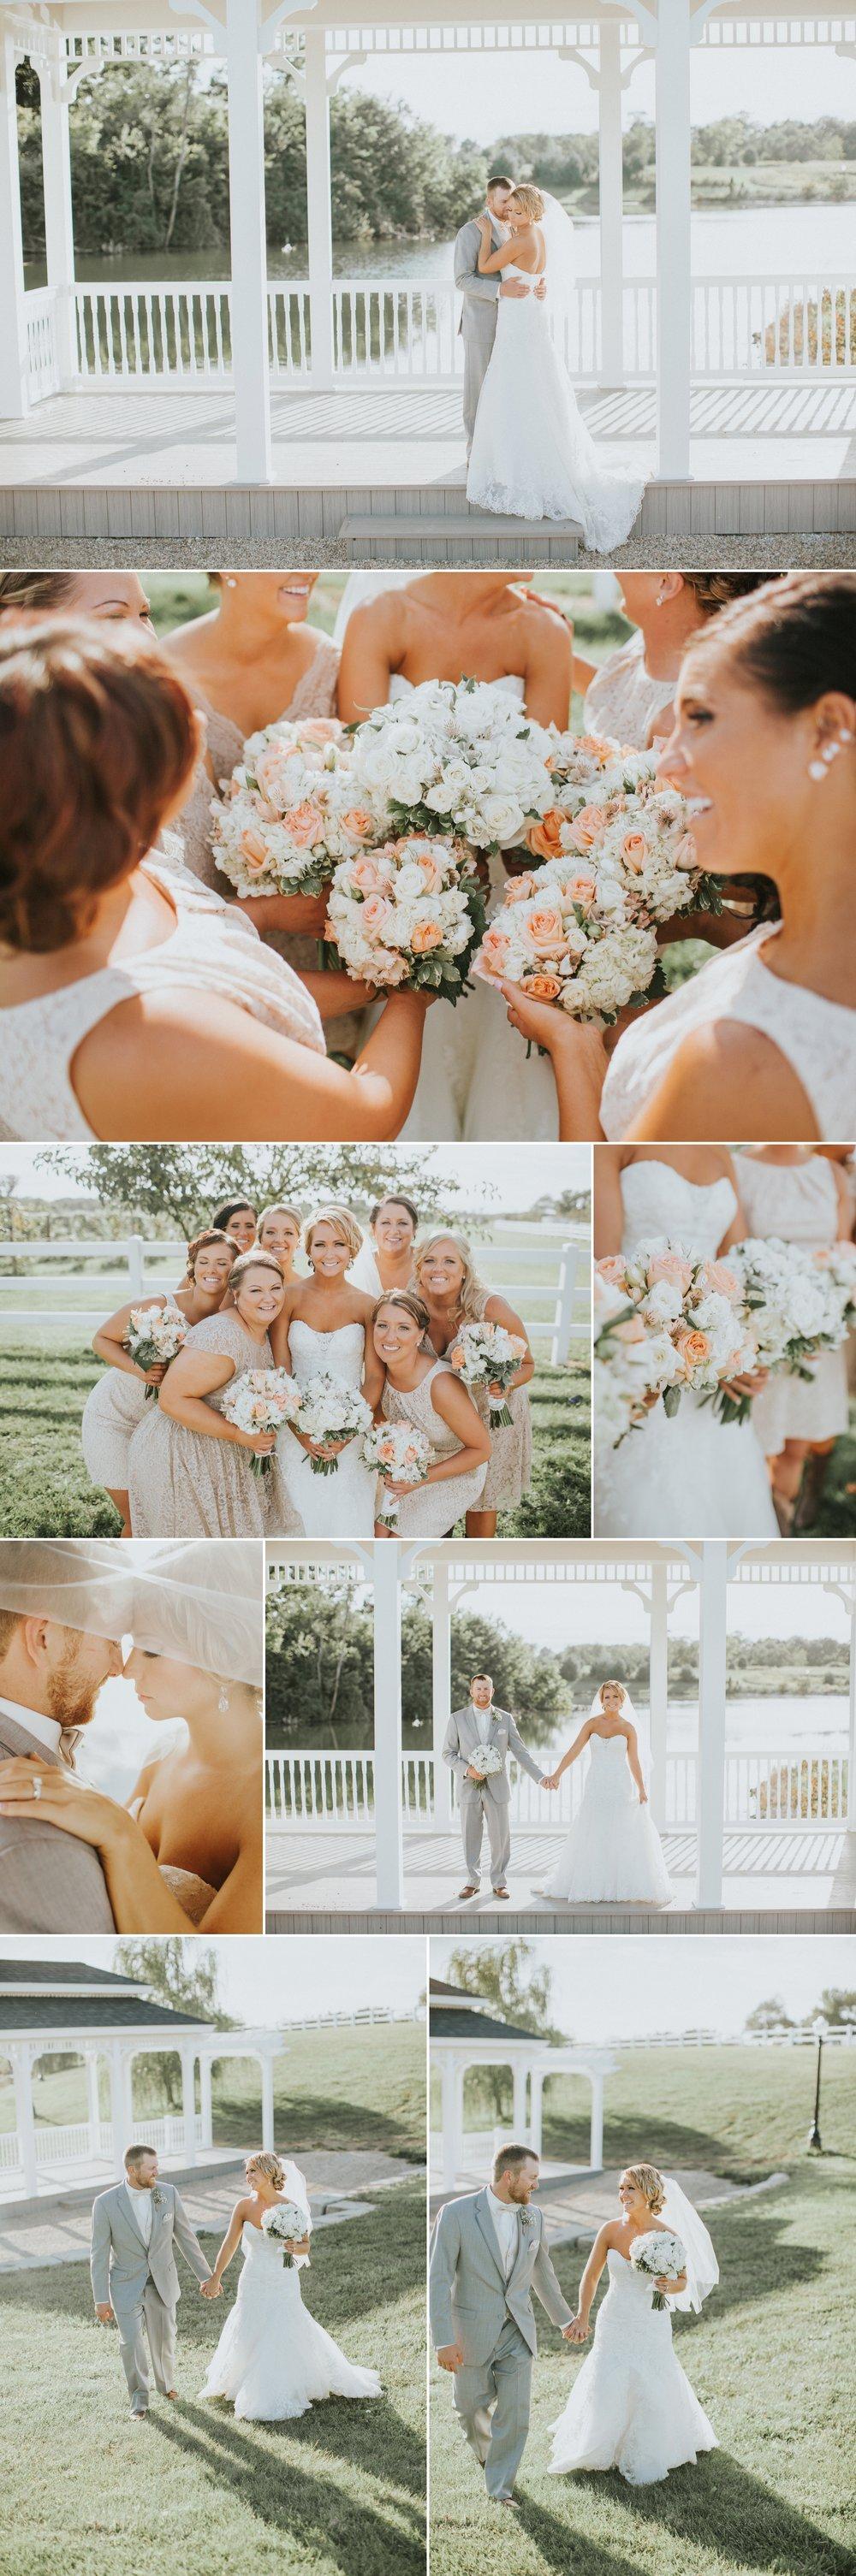 The Olson Wedding 1.jpg